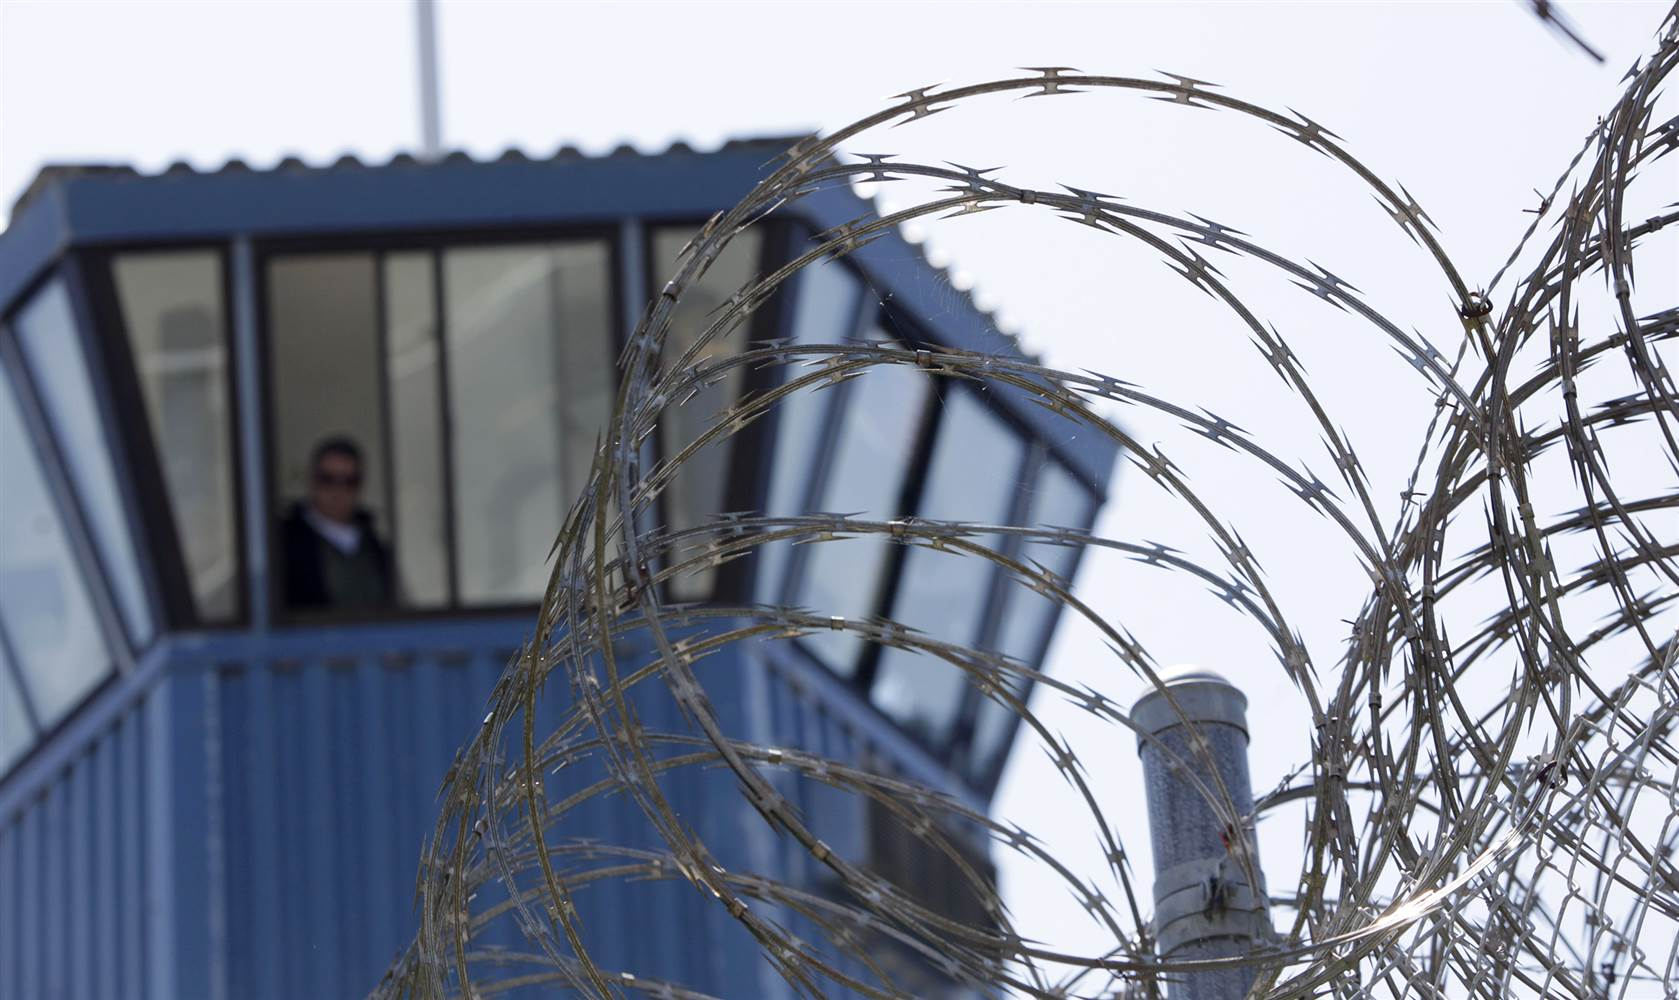 prison4_1490632443974.jpg